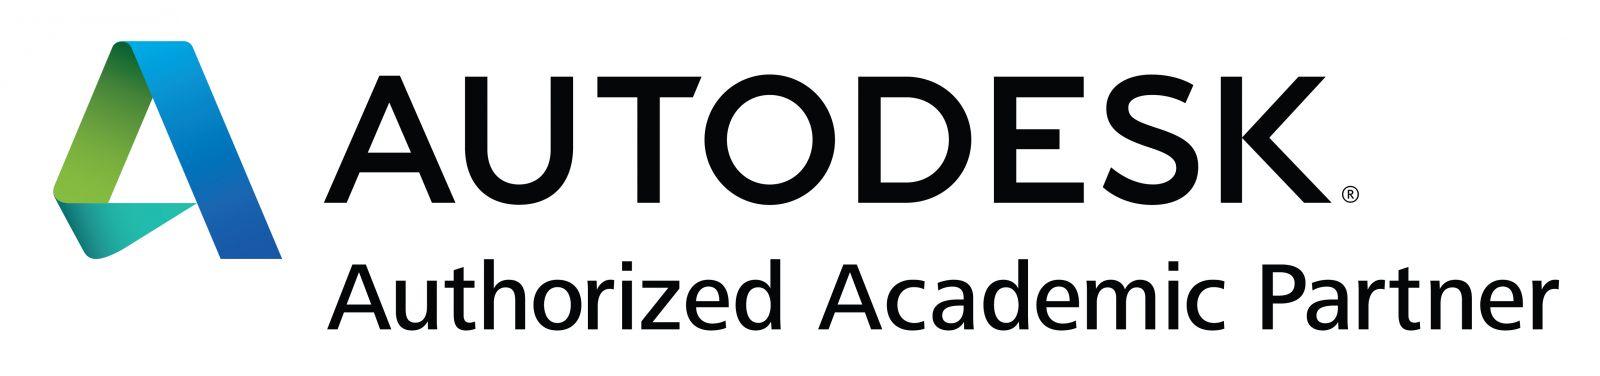 Autodesk Authorised Academic Partner